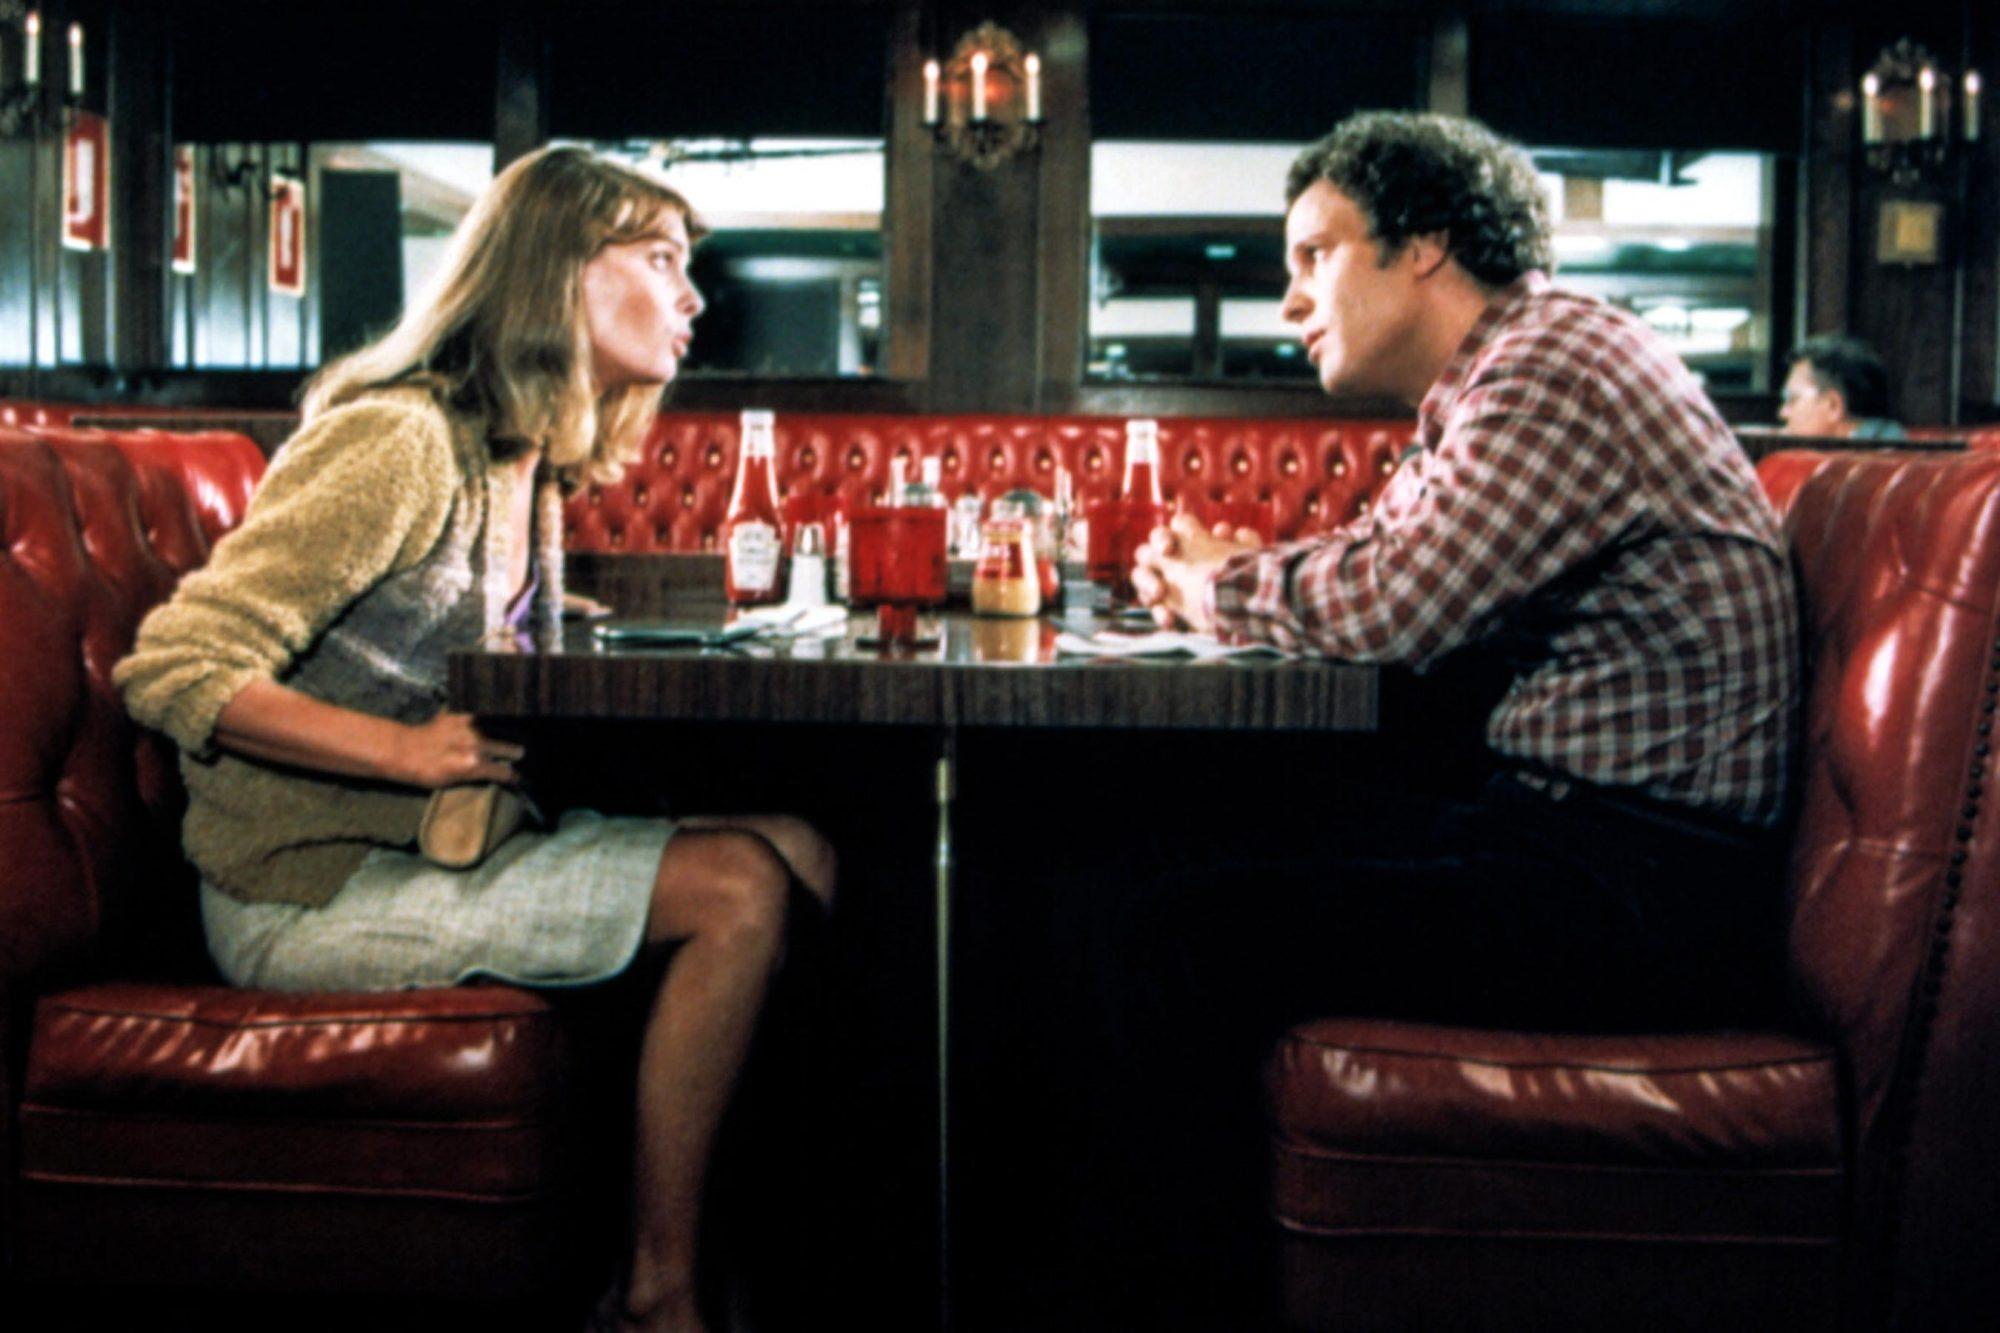 MODERN ROMANCE, Kathryn Harrold, Albert Brooks, 1981, (c) Columbia/courtesy Everett Collection